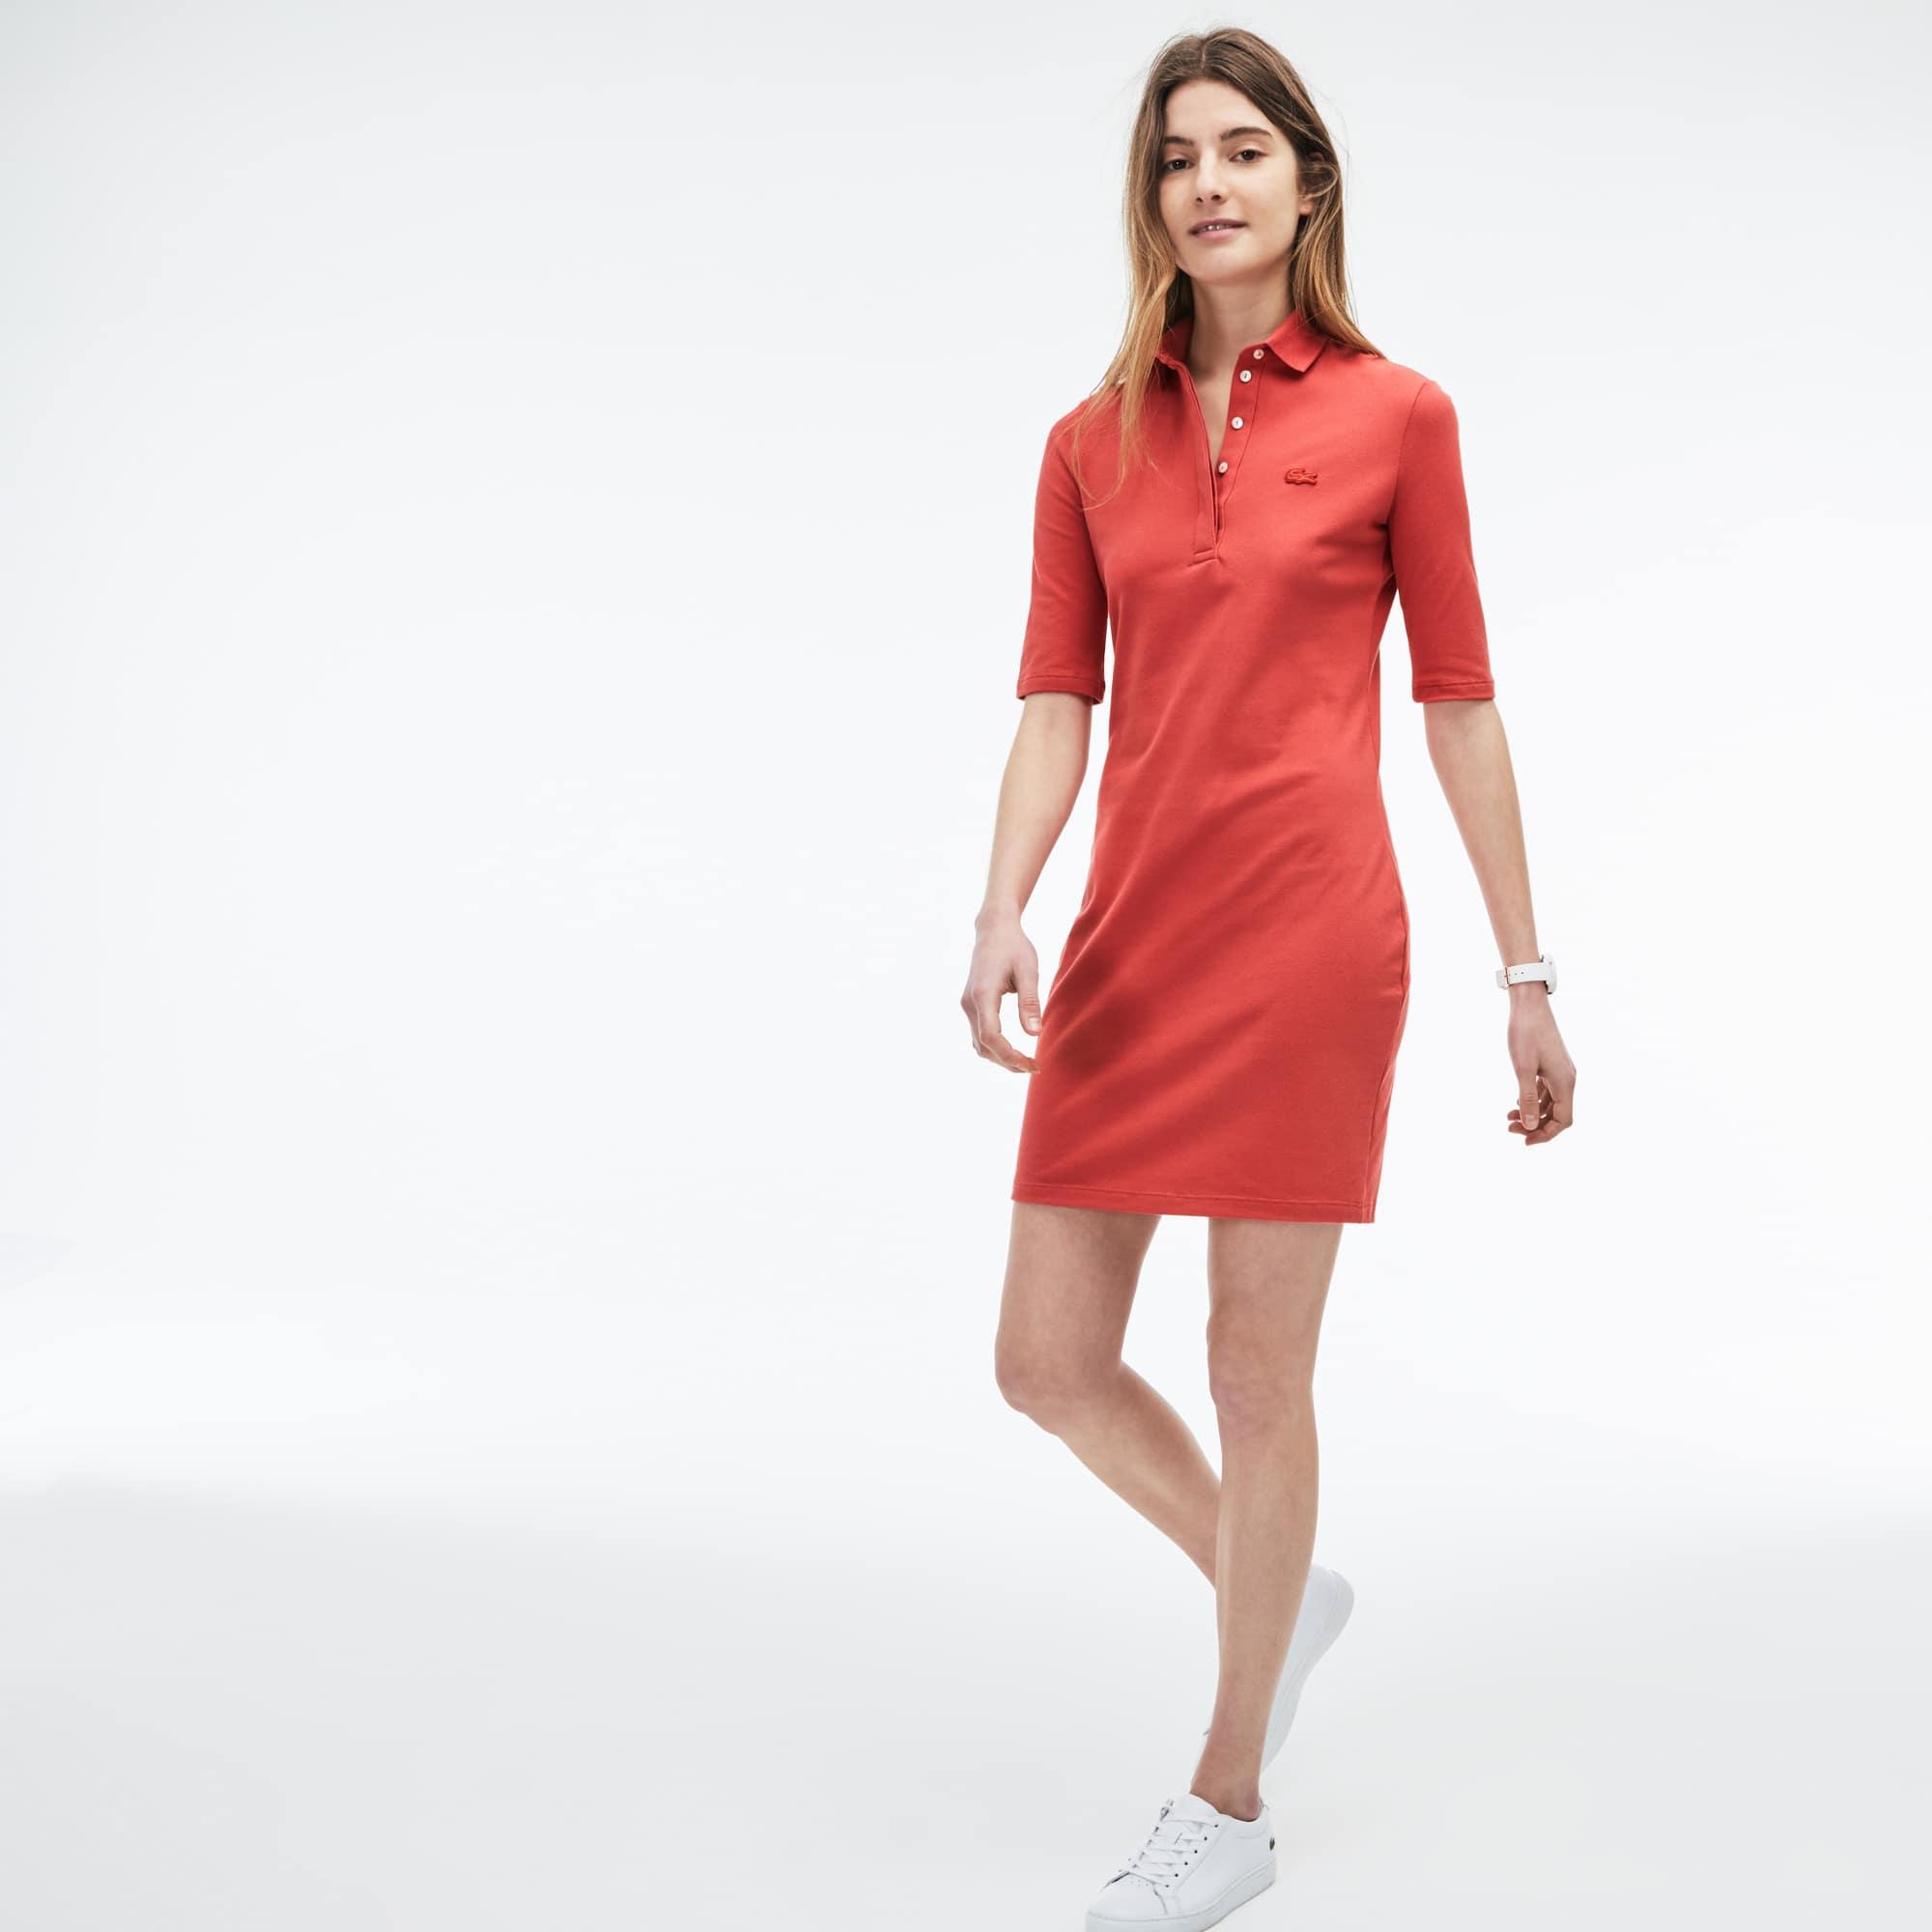 Slim Fit Damen-Polokleid aus Mini-Piqué mit Stretch